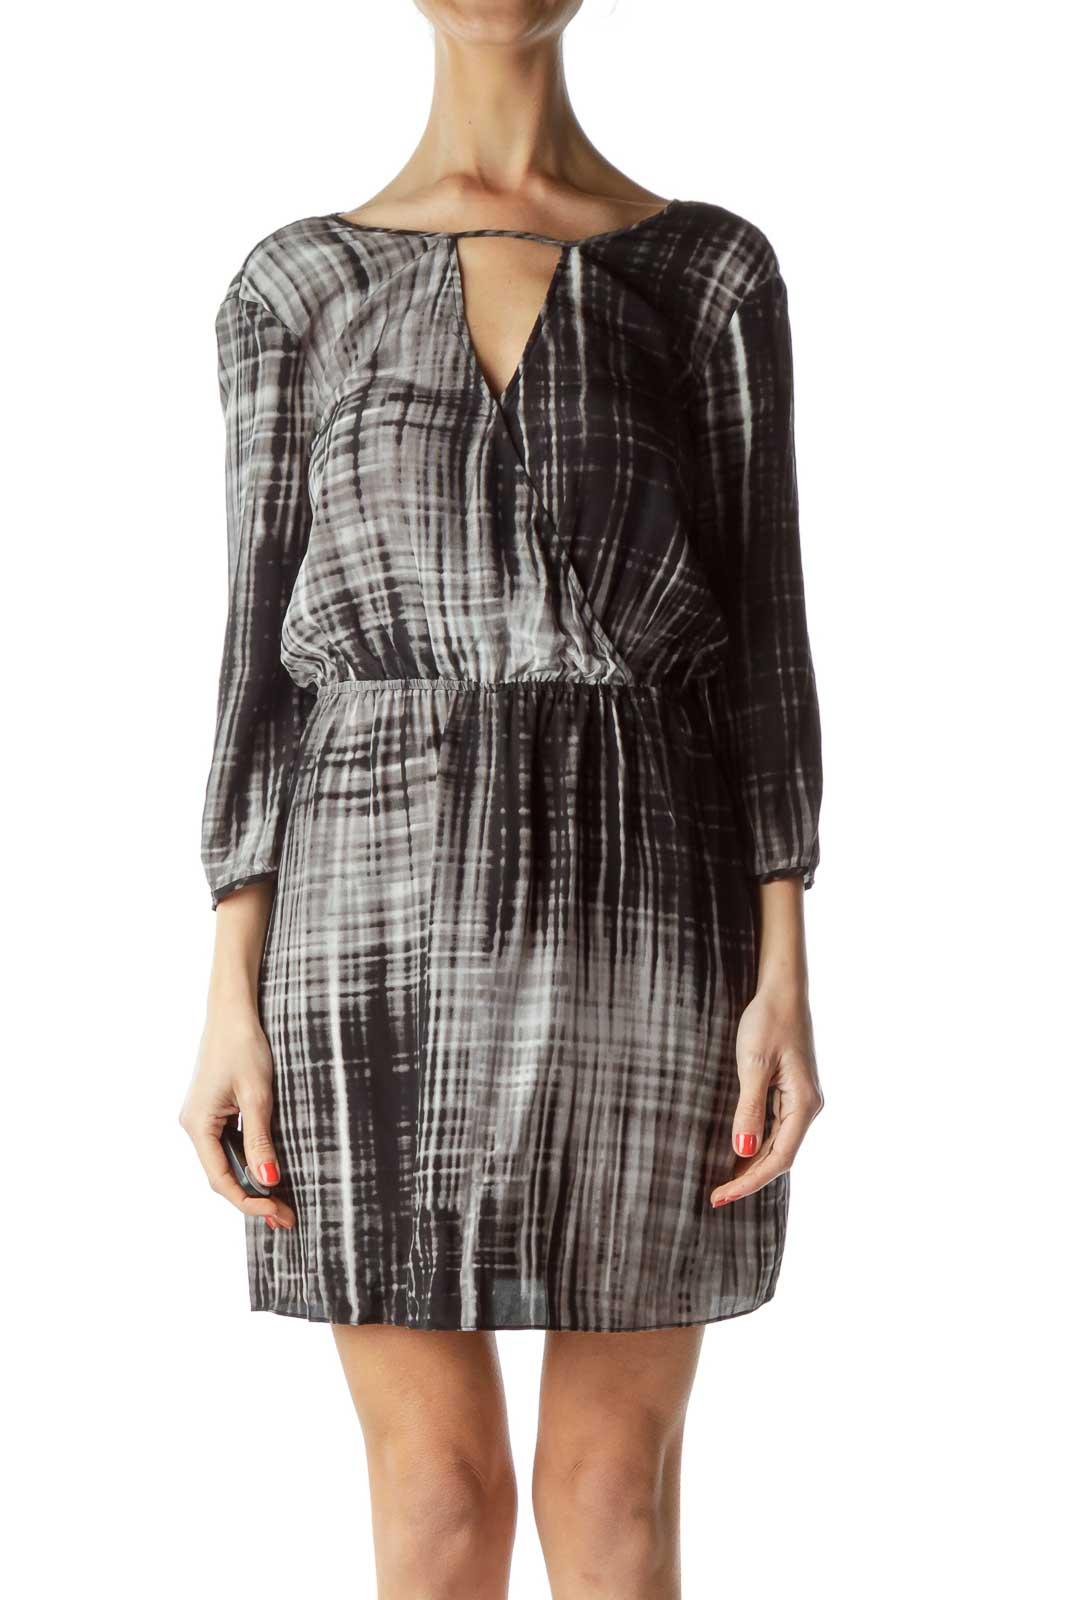 Gray Black Tie Dye Day Dress Front